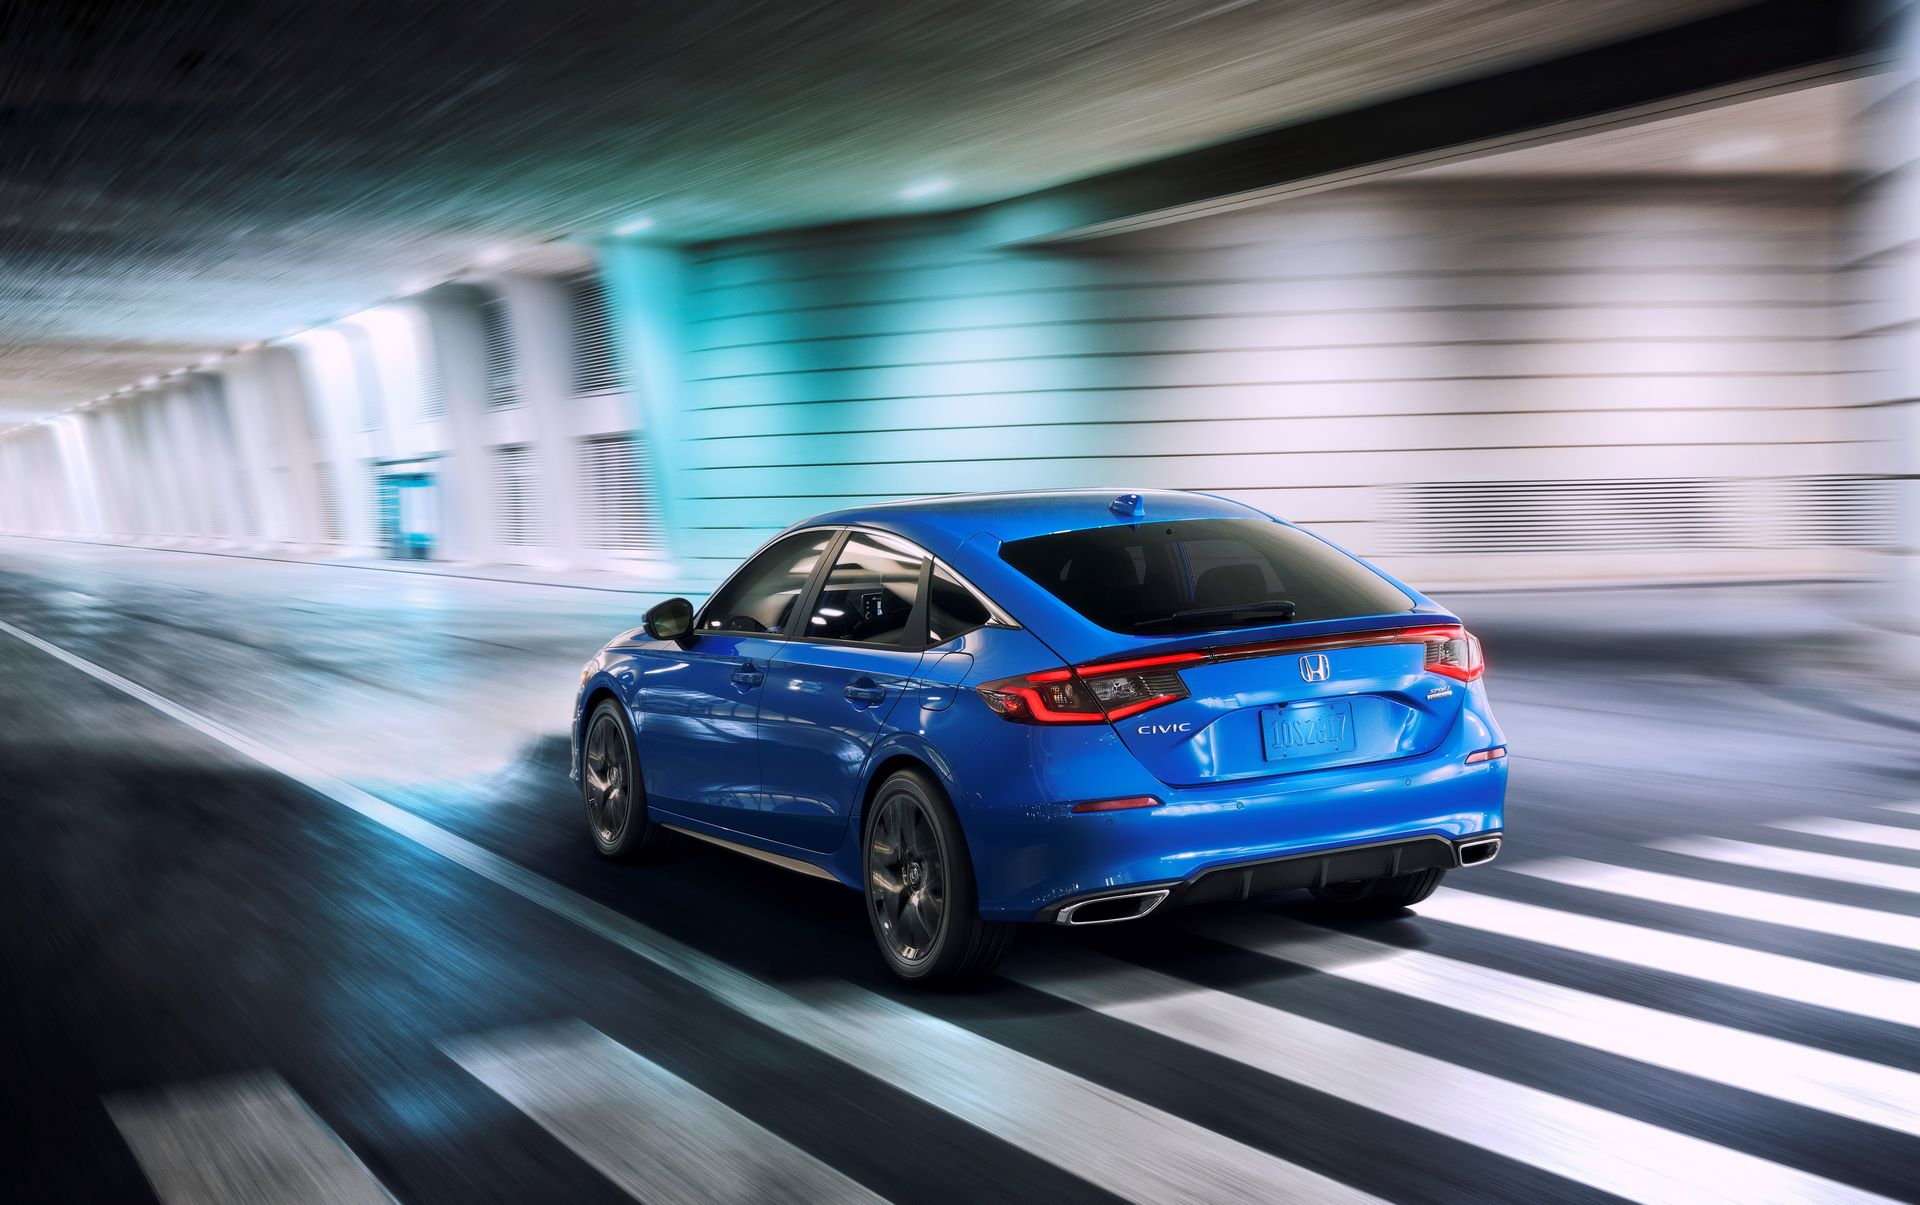 Honda-Civic-hatchback-3